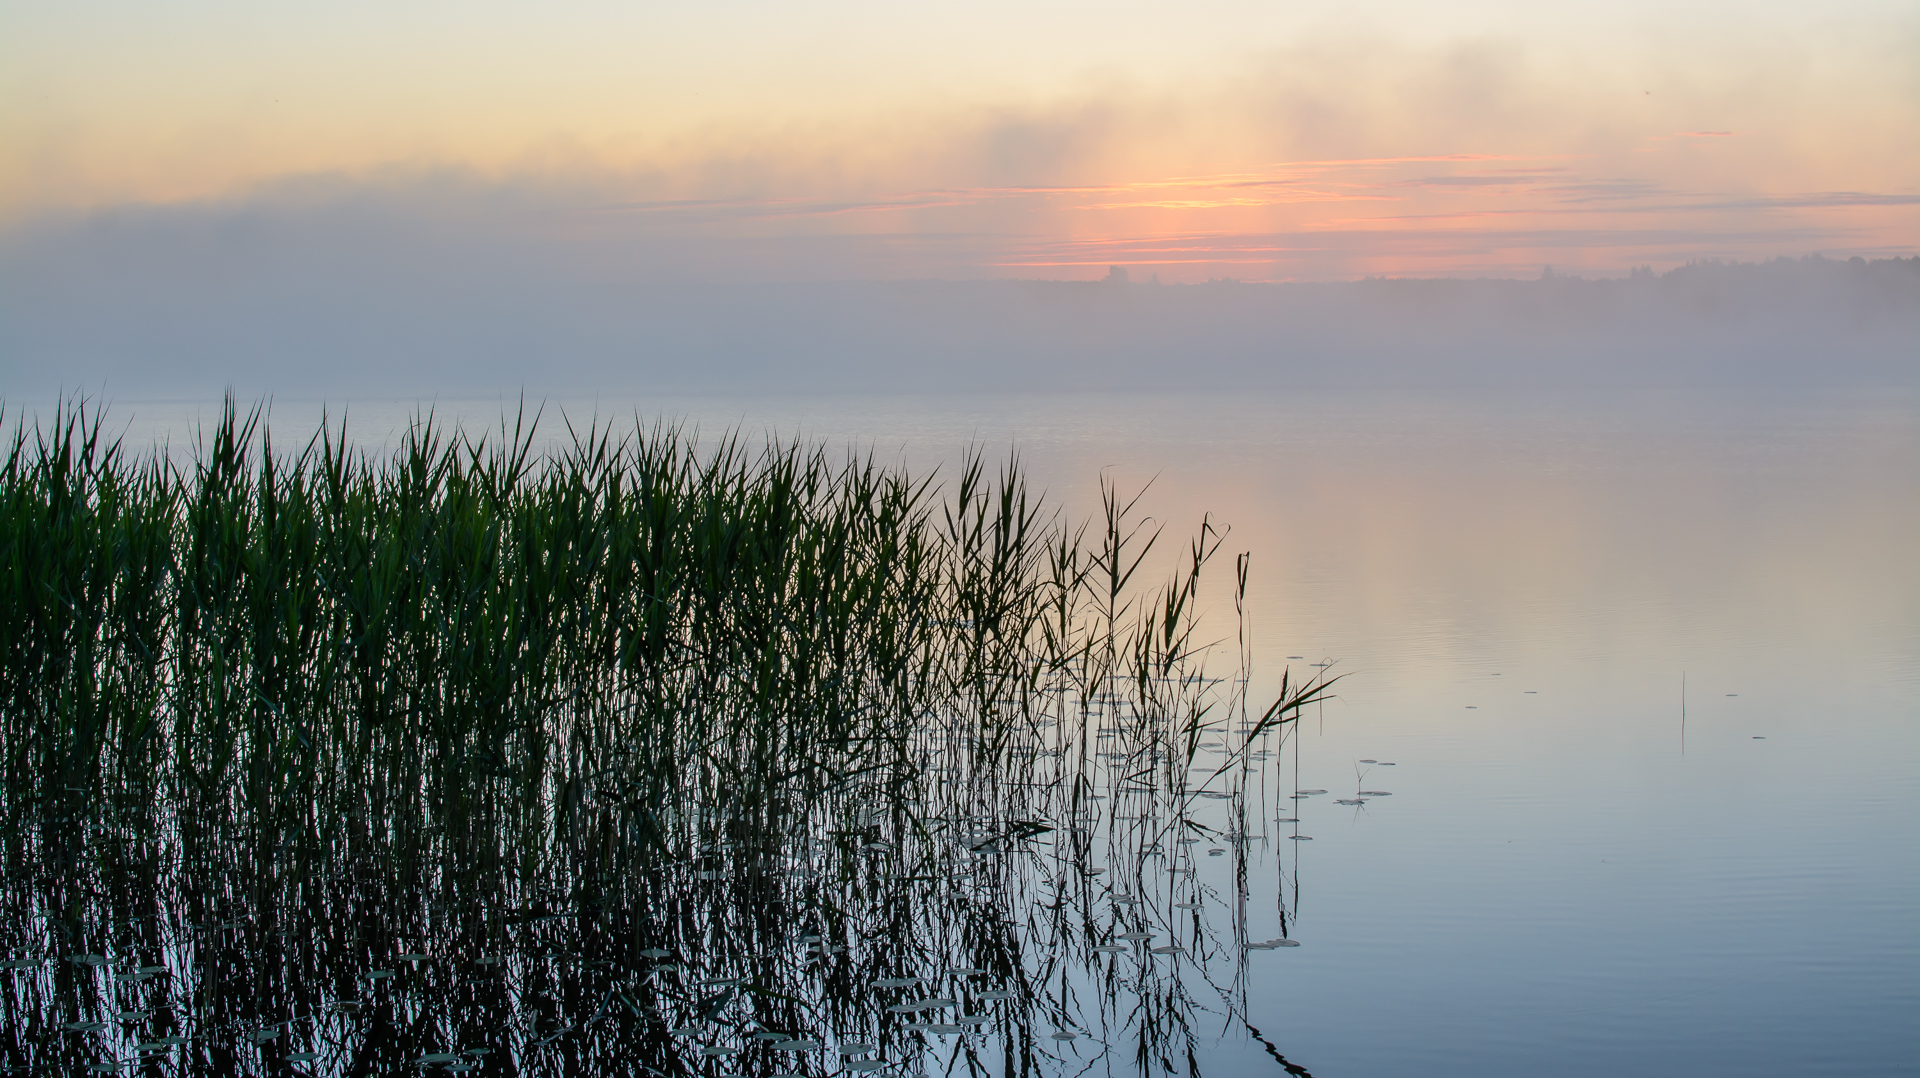 Хроника рыбацкого утра. Автор фото: Вячеслав Степанов